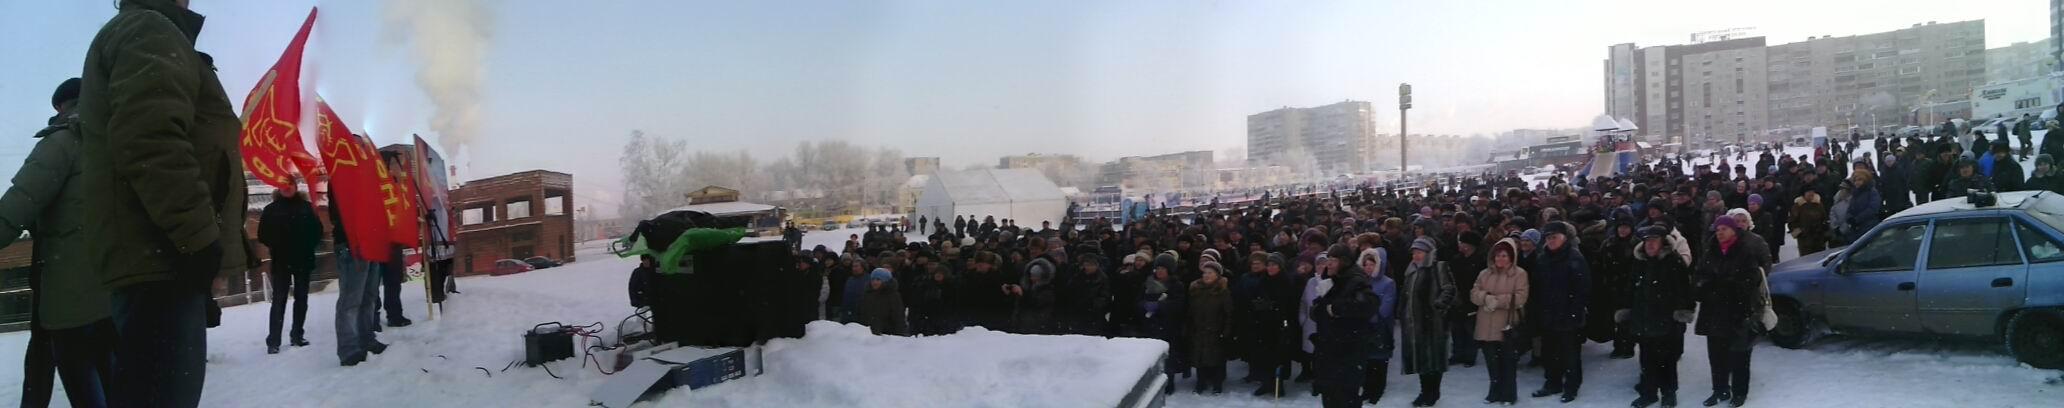 Митинг в Череповце против ДЕЗАВИДА 25.01.2014